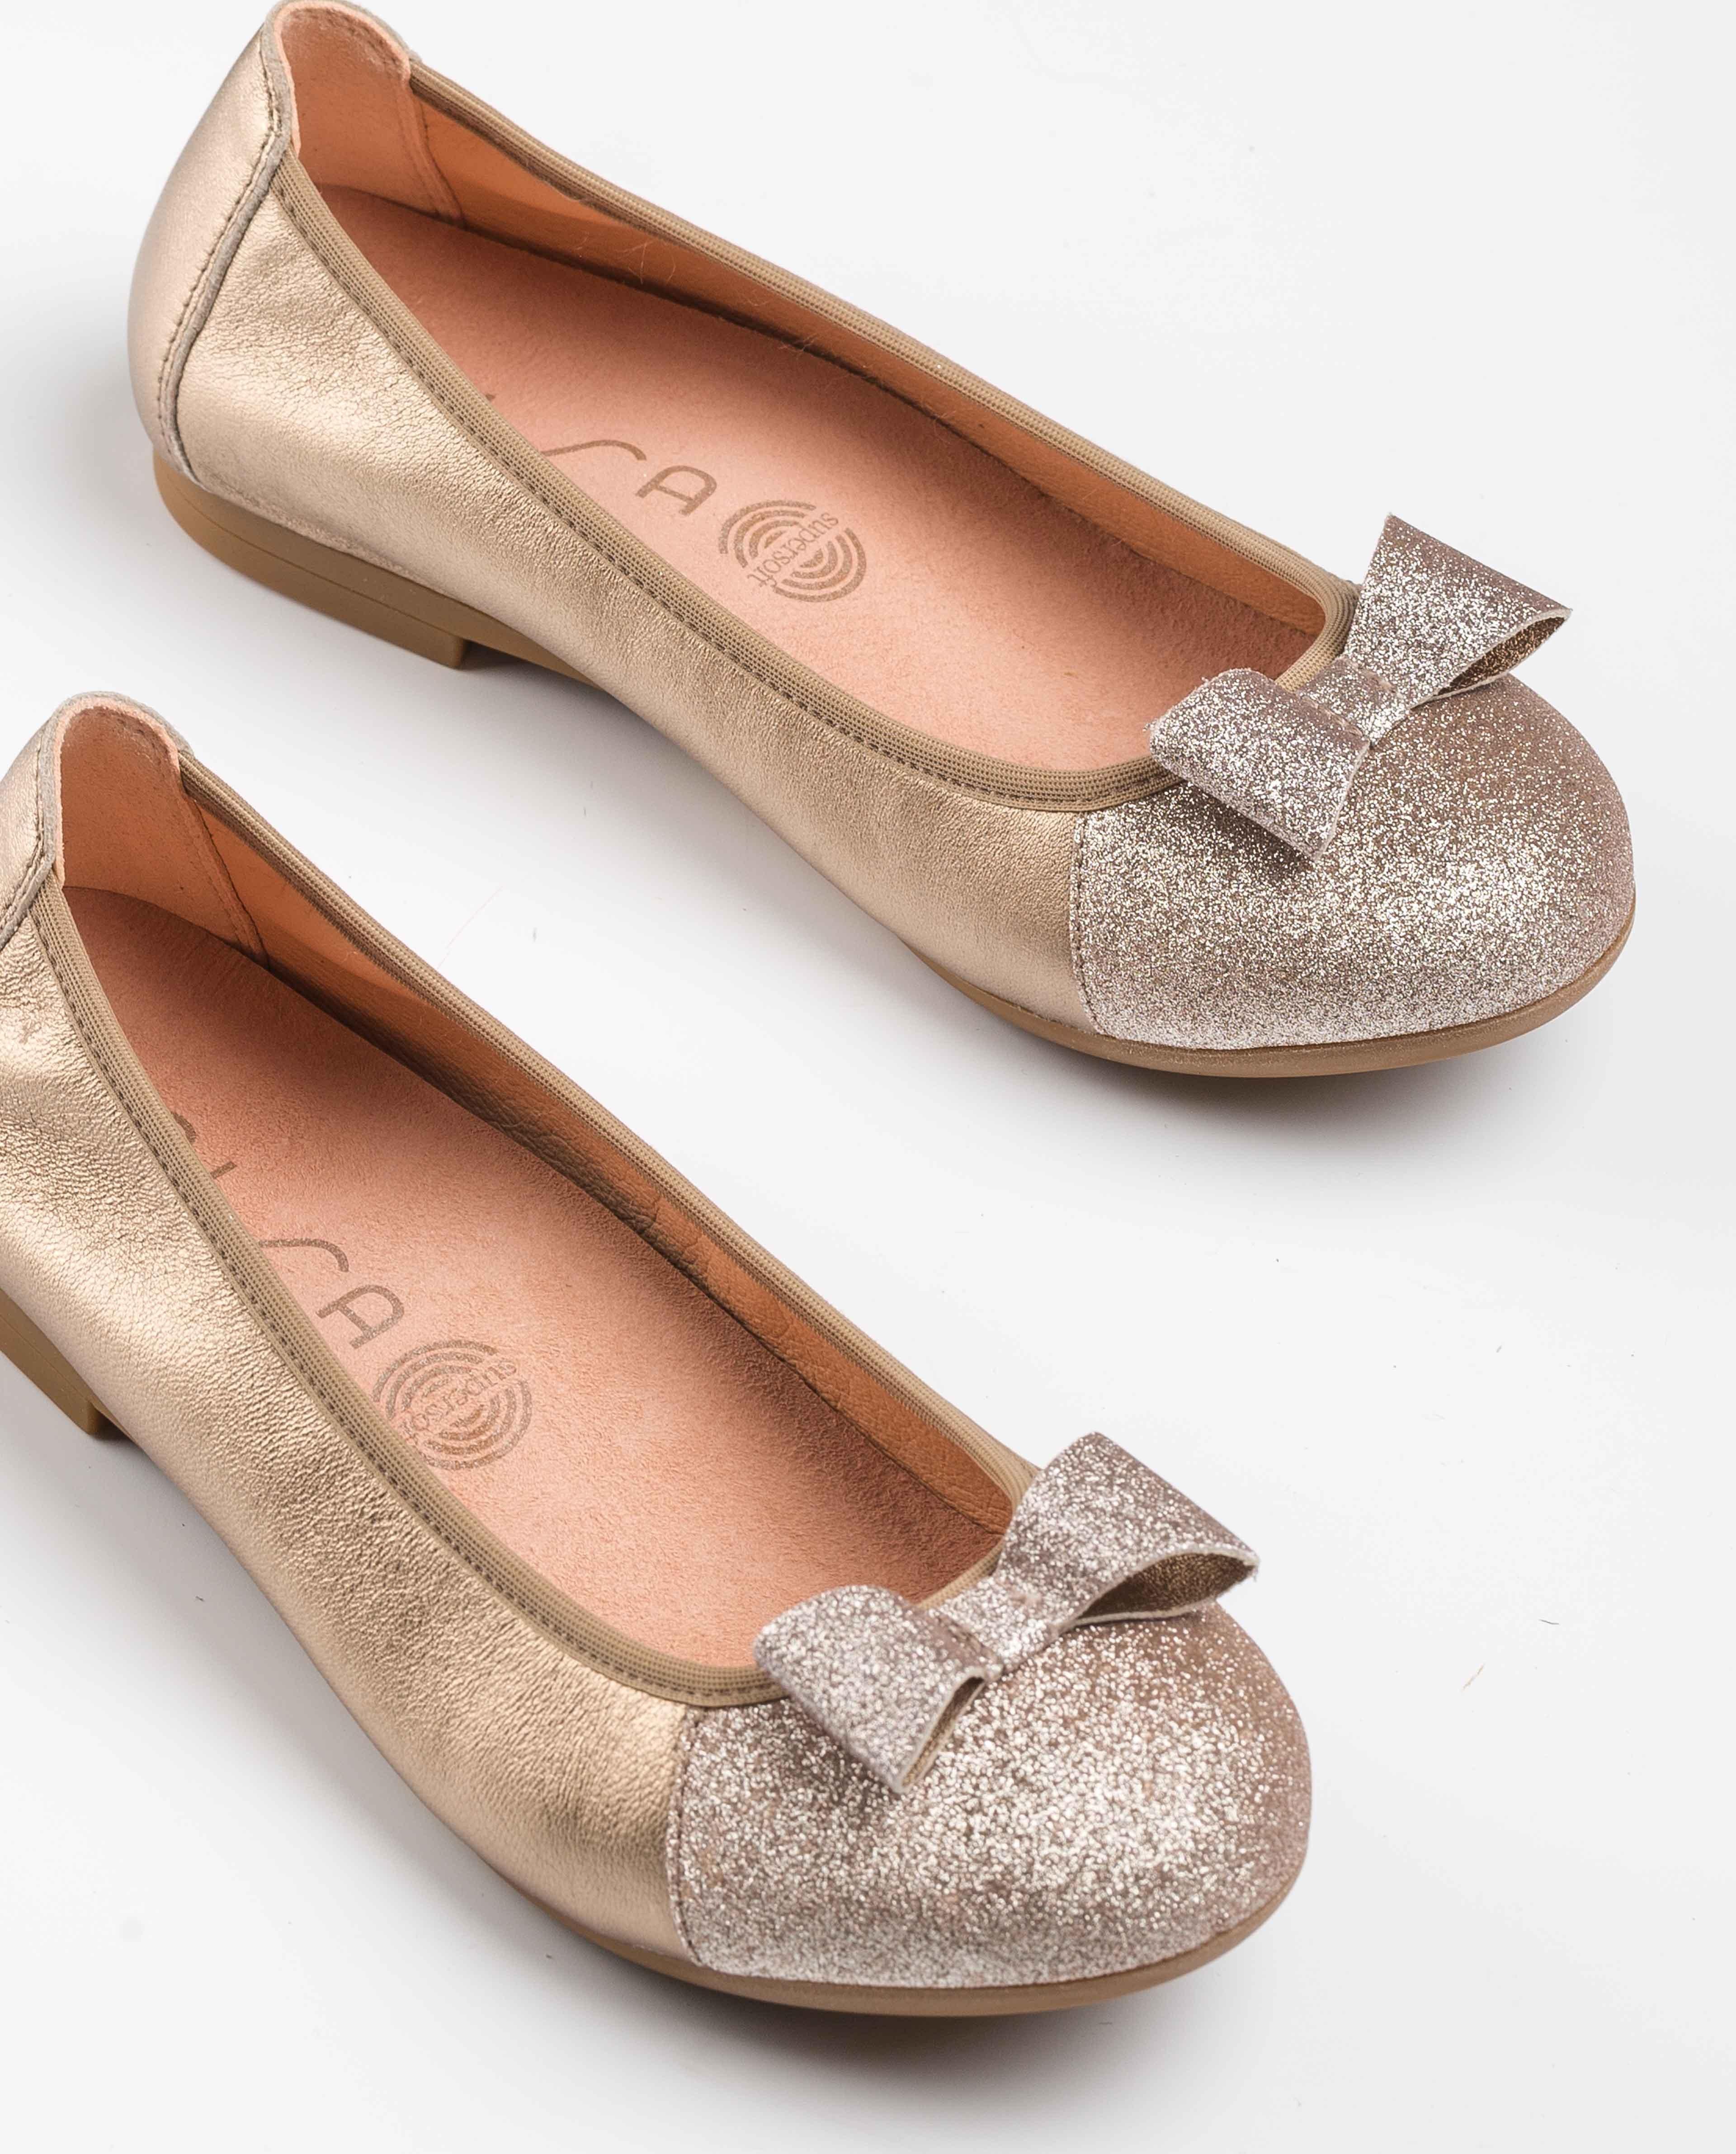 UNISA Copper metal effect ballerinas CORY_LMT_SI mumm 2